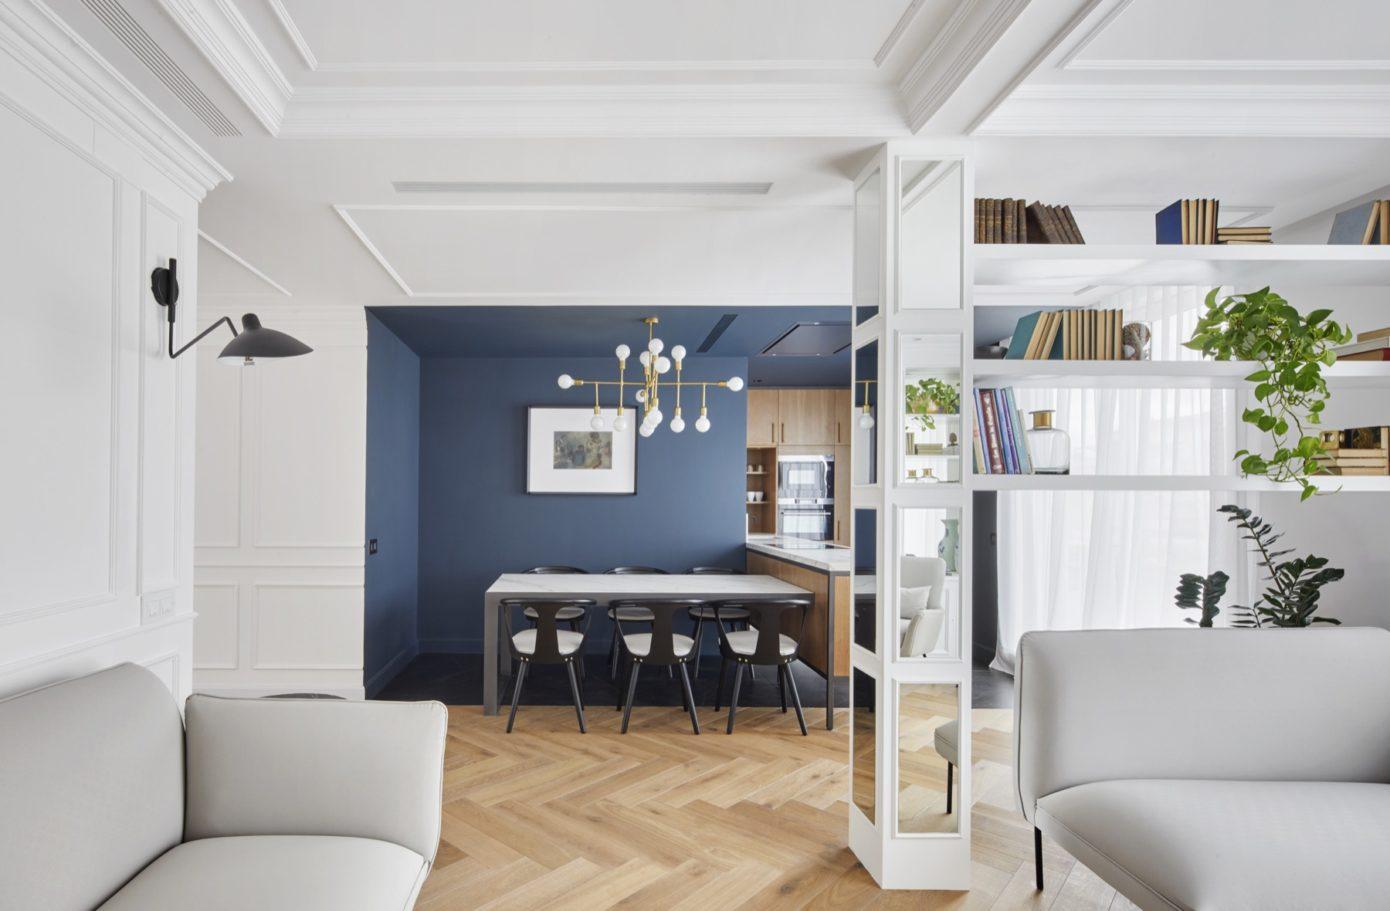 New York Alcove Studio apartment - living room (NY-15118) photo 1 of ...